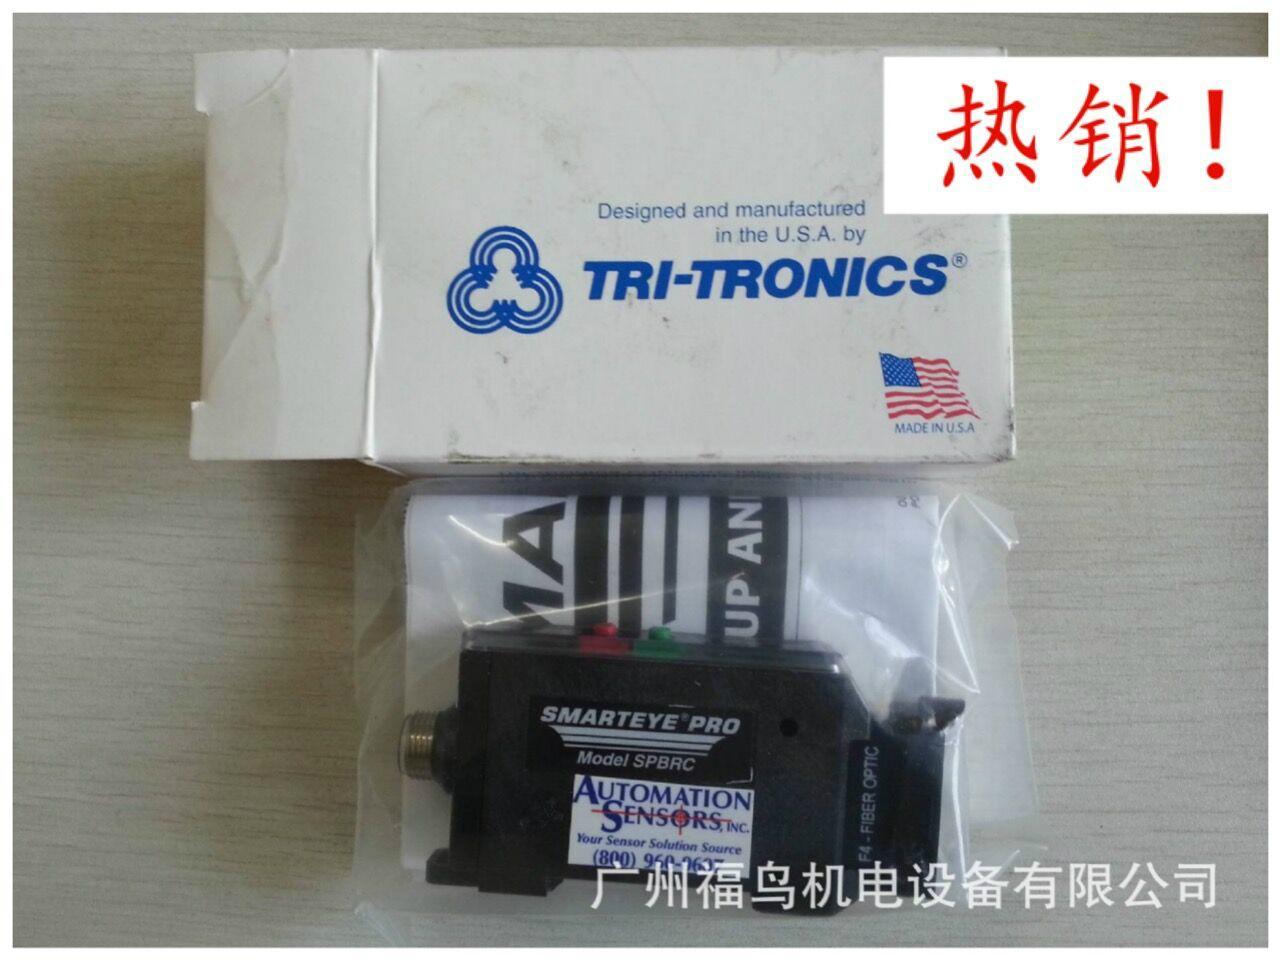 TRI-TRONICS傳感器, 型號: SPBRCF4